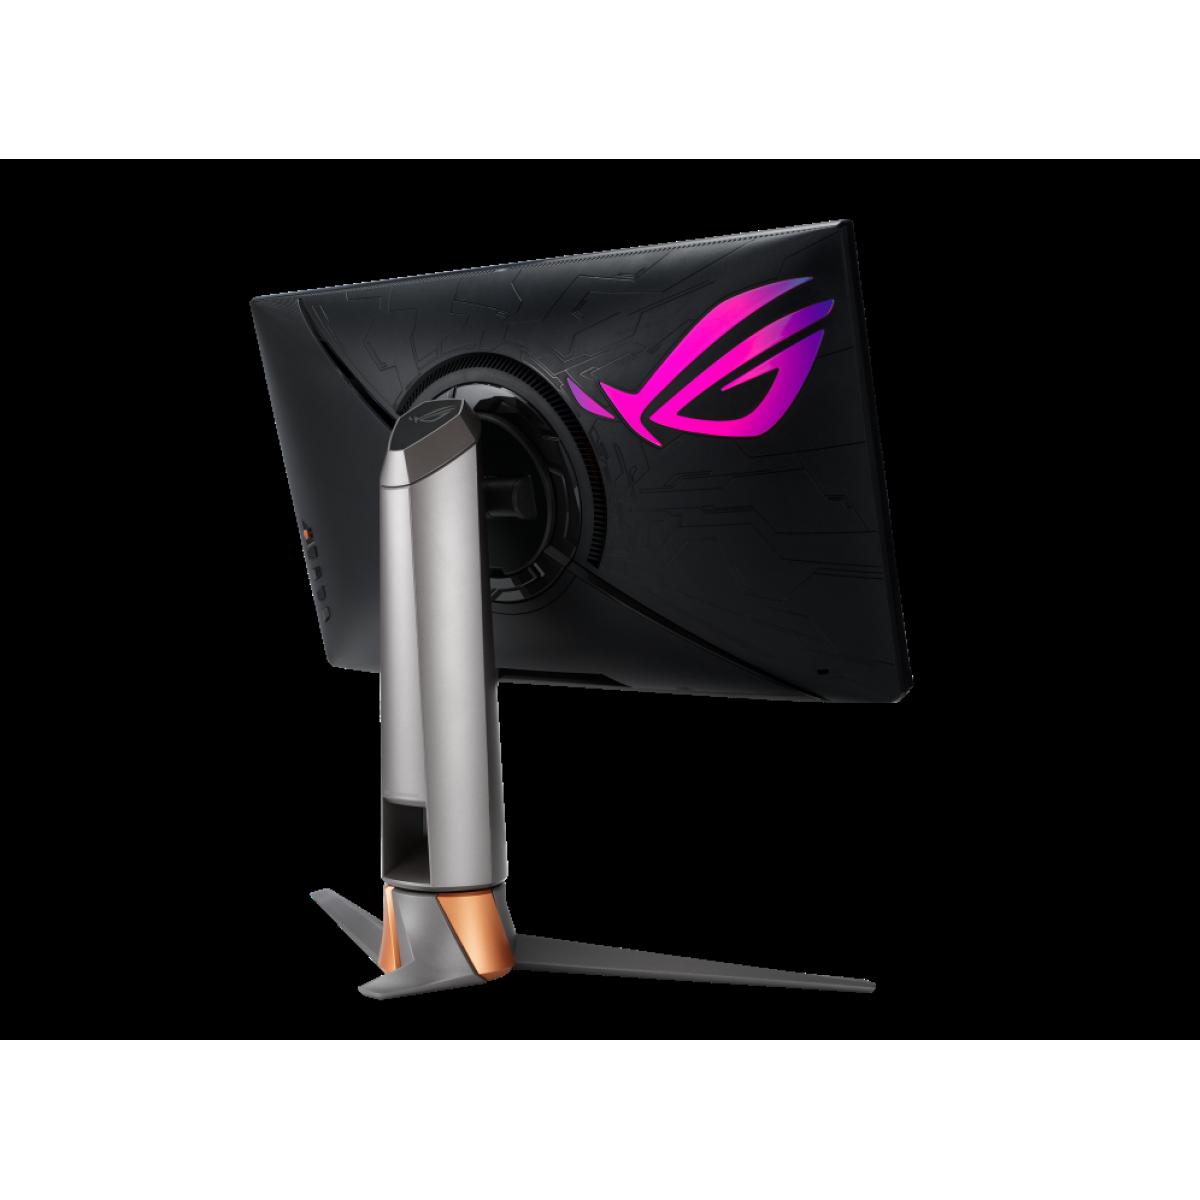 Monitor Gamer ASUS ROG SWIFT, 24.5 Pol, FullHD, 360Hz, 1ms, IPS, GSync, HDR10, Latency Analyzer, 90LM05Q3-B013X0